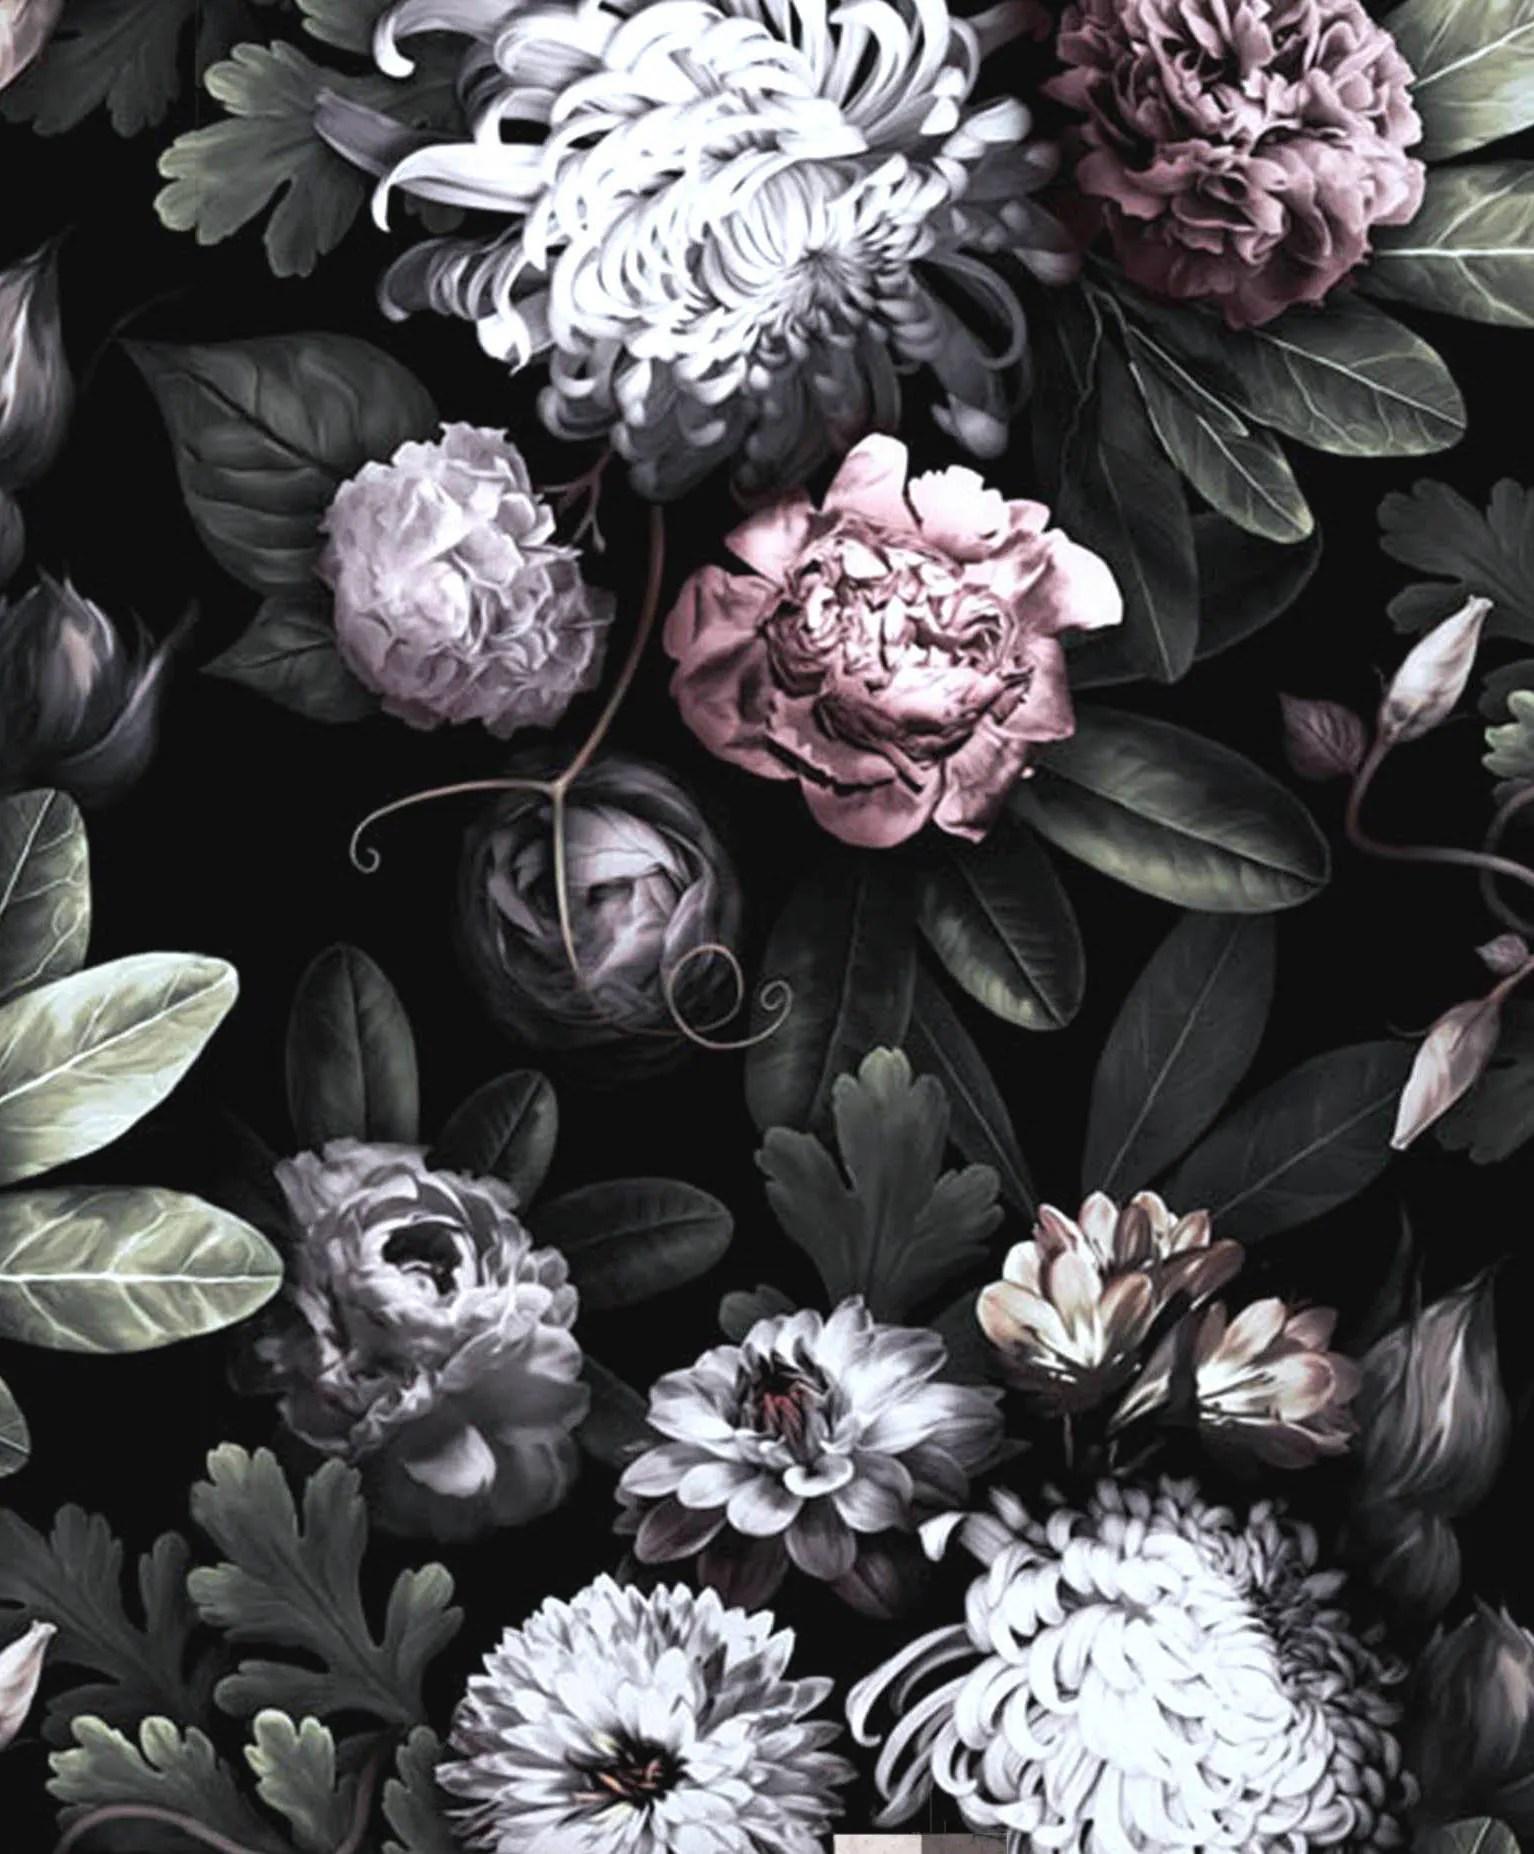 Iphone 5 Wallpaper Floral Dark Floral Wallpaper Floral Wallpaper Dark Flowers